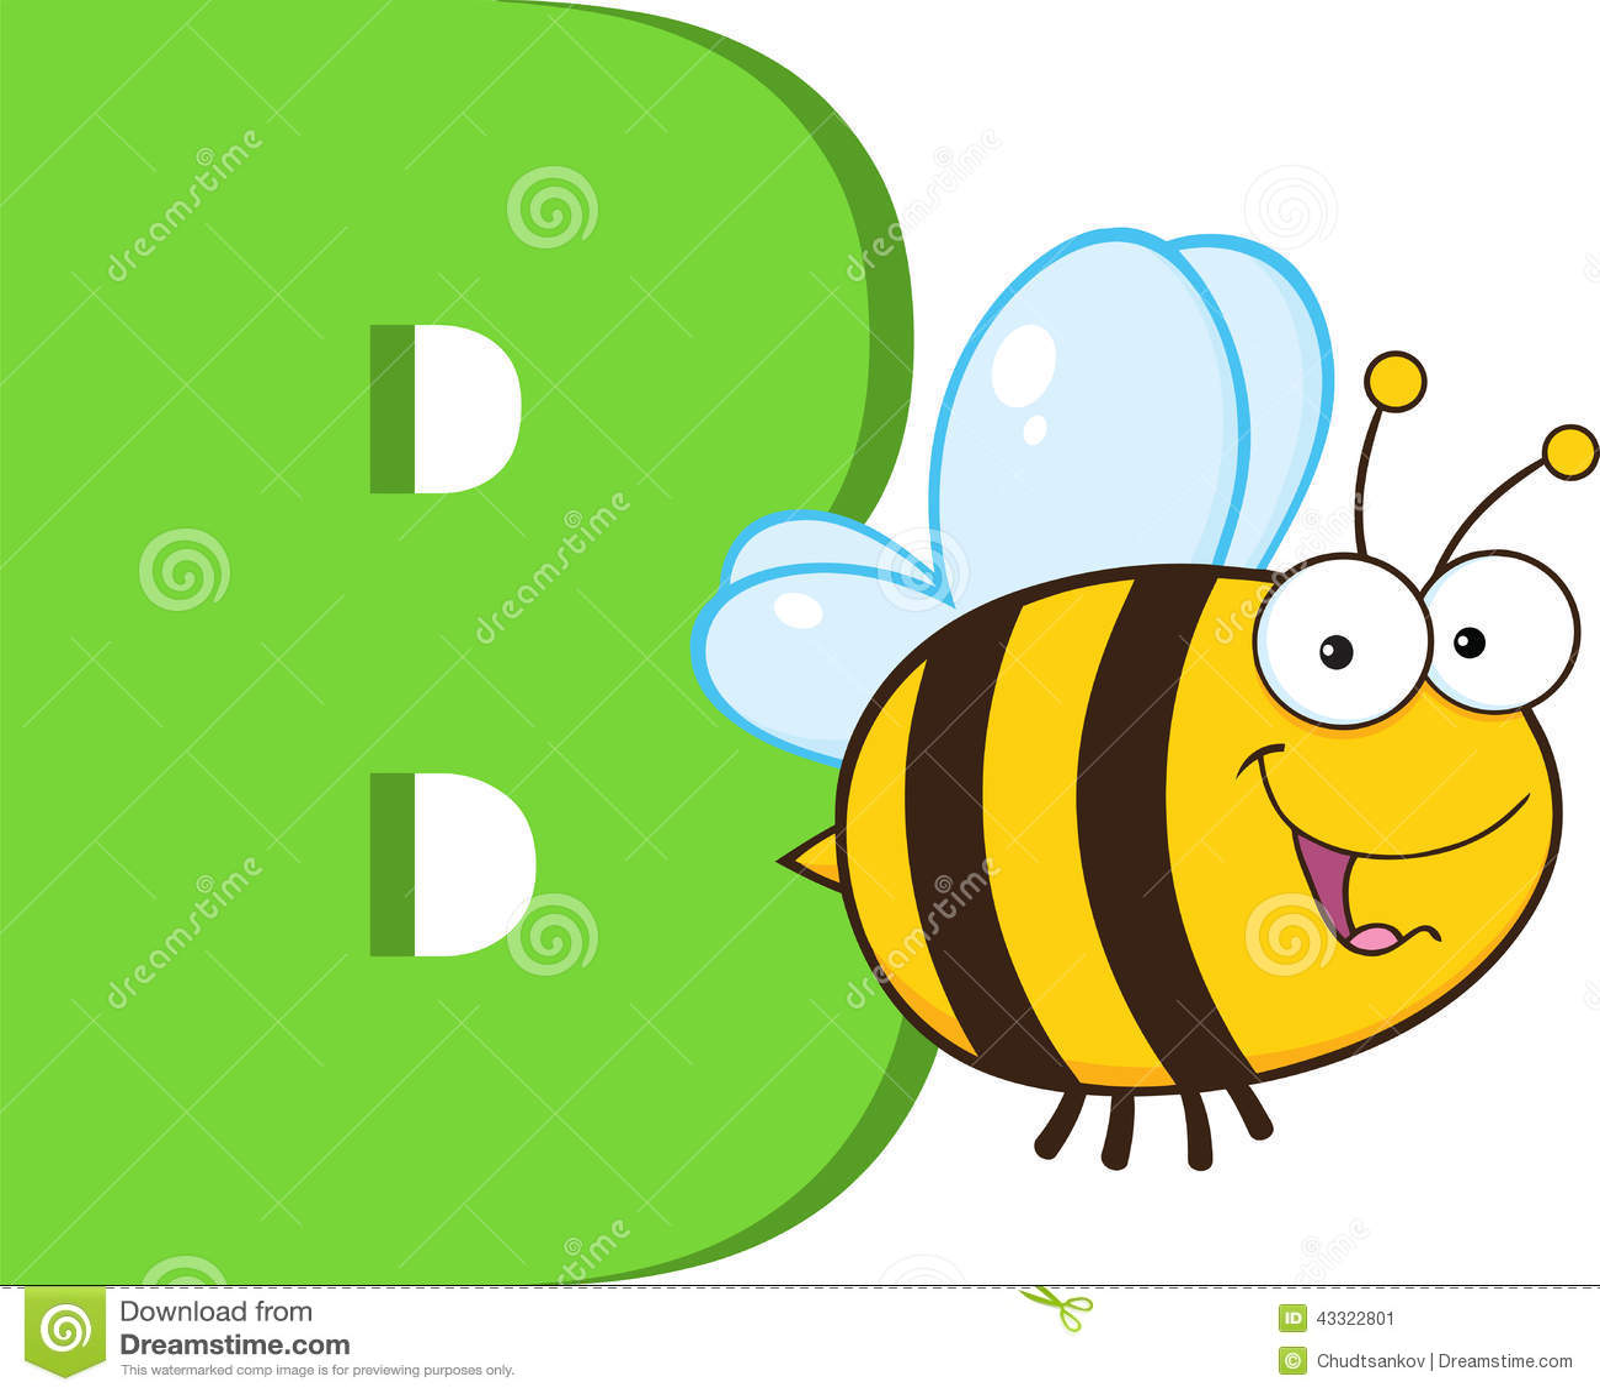 Funny Cartoon Alphabet B With Bee Stock Illustration